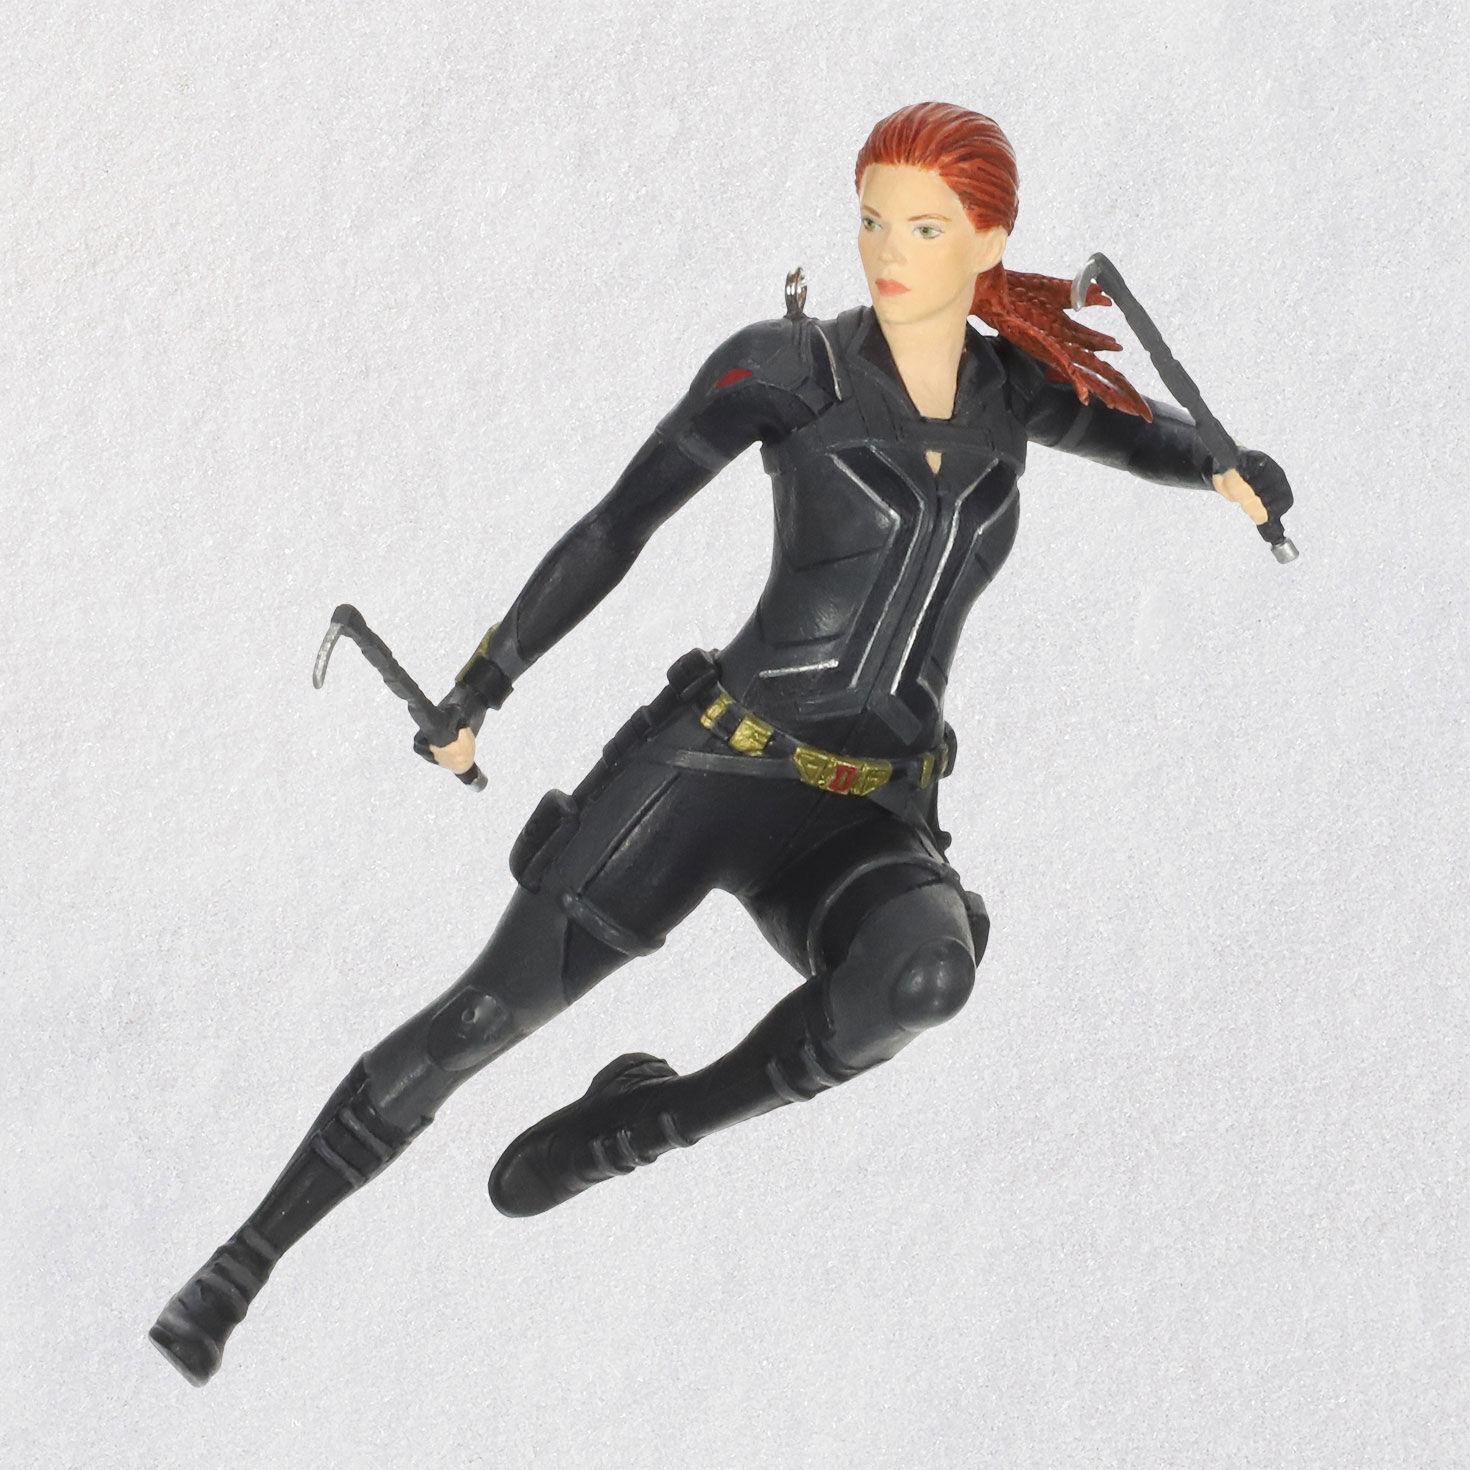 Widow Christmas 2020 Marvel Studios Black Widow Ornament   Keepsake Ornaments   Hallmark